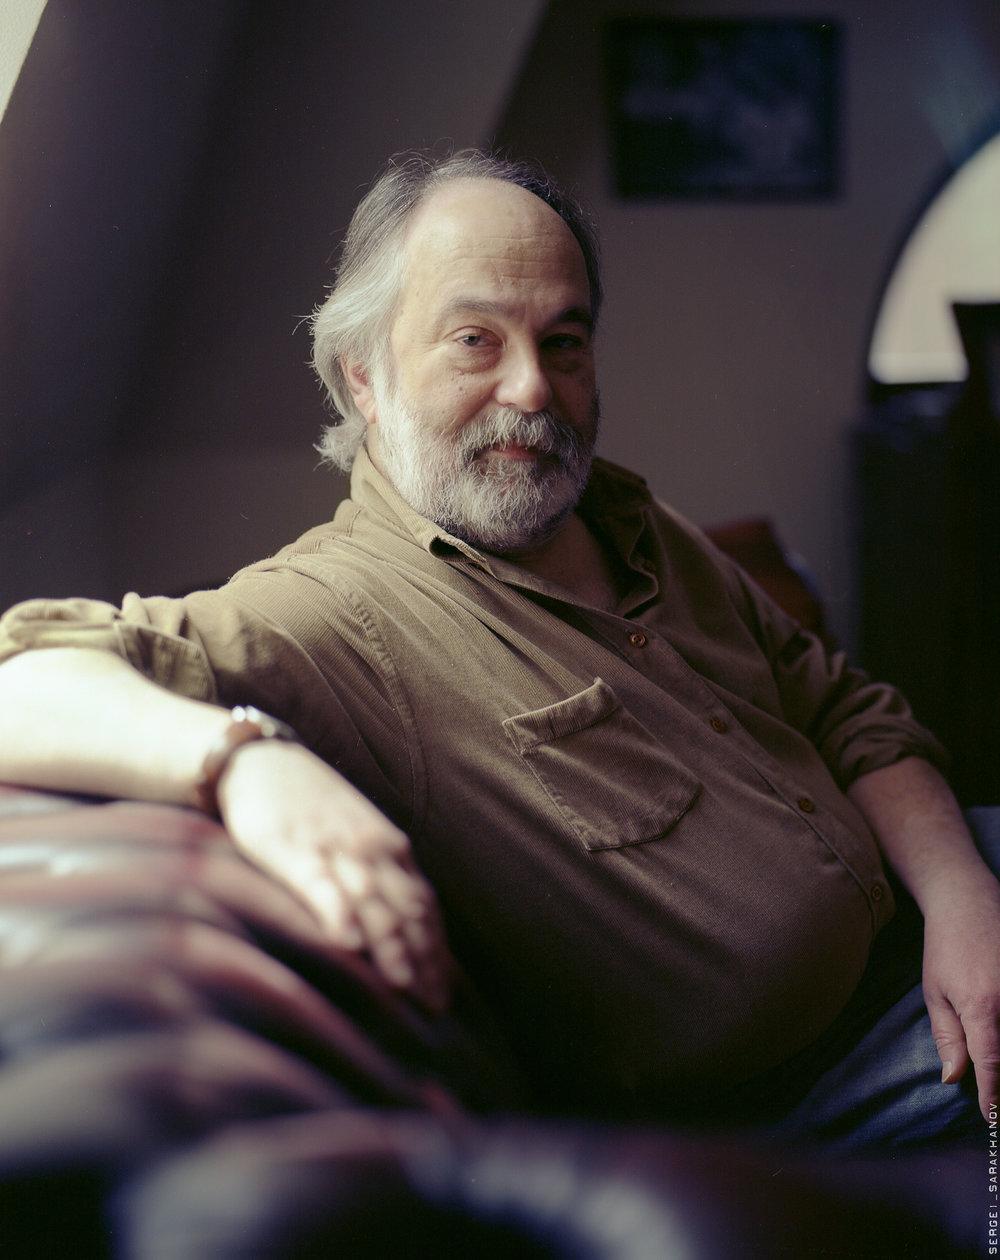 Dmitry Svetozarov